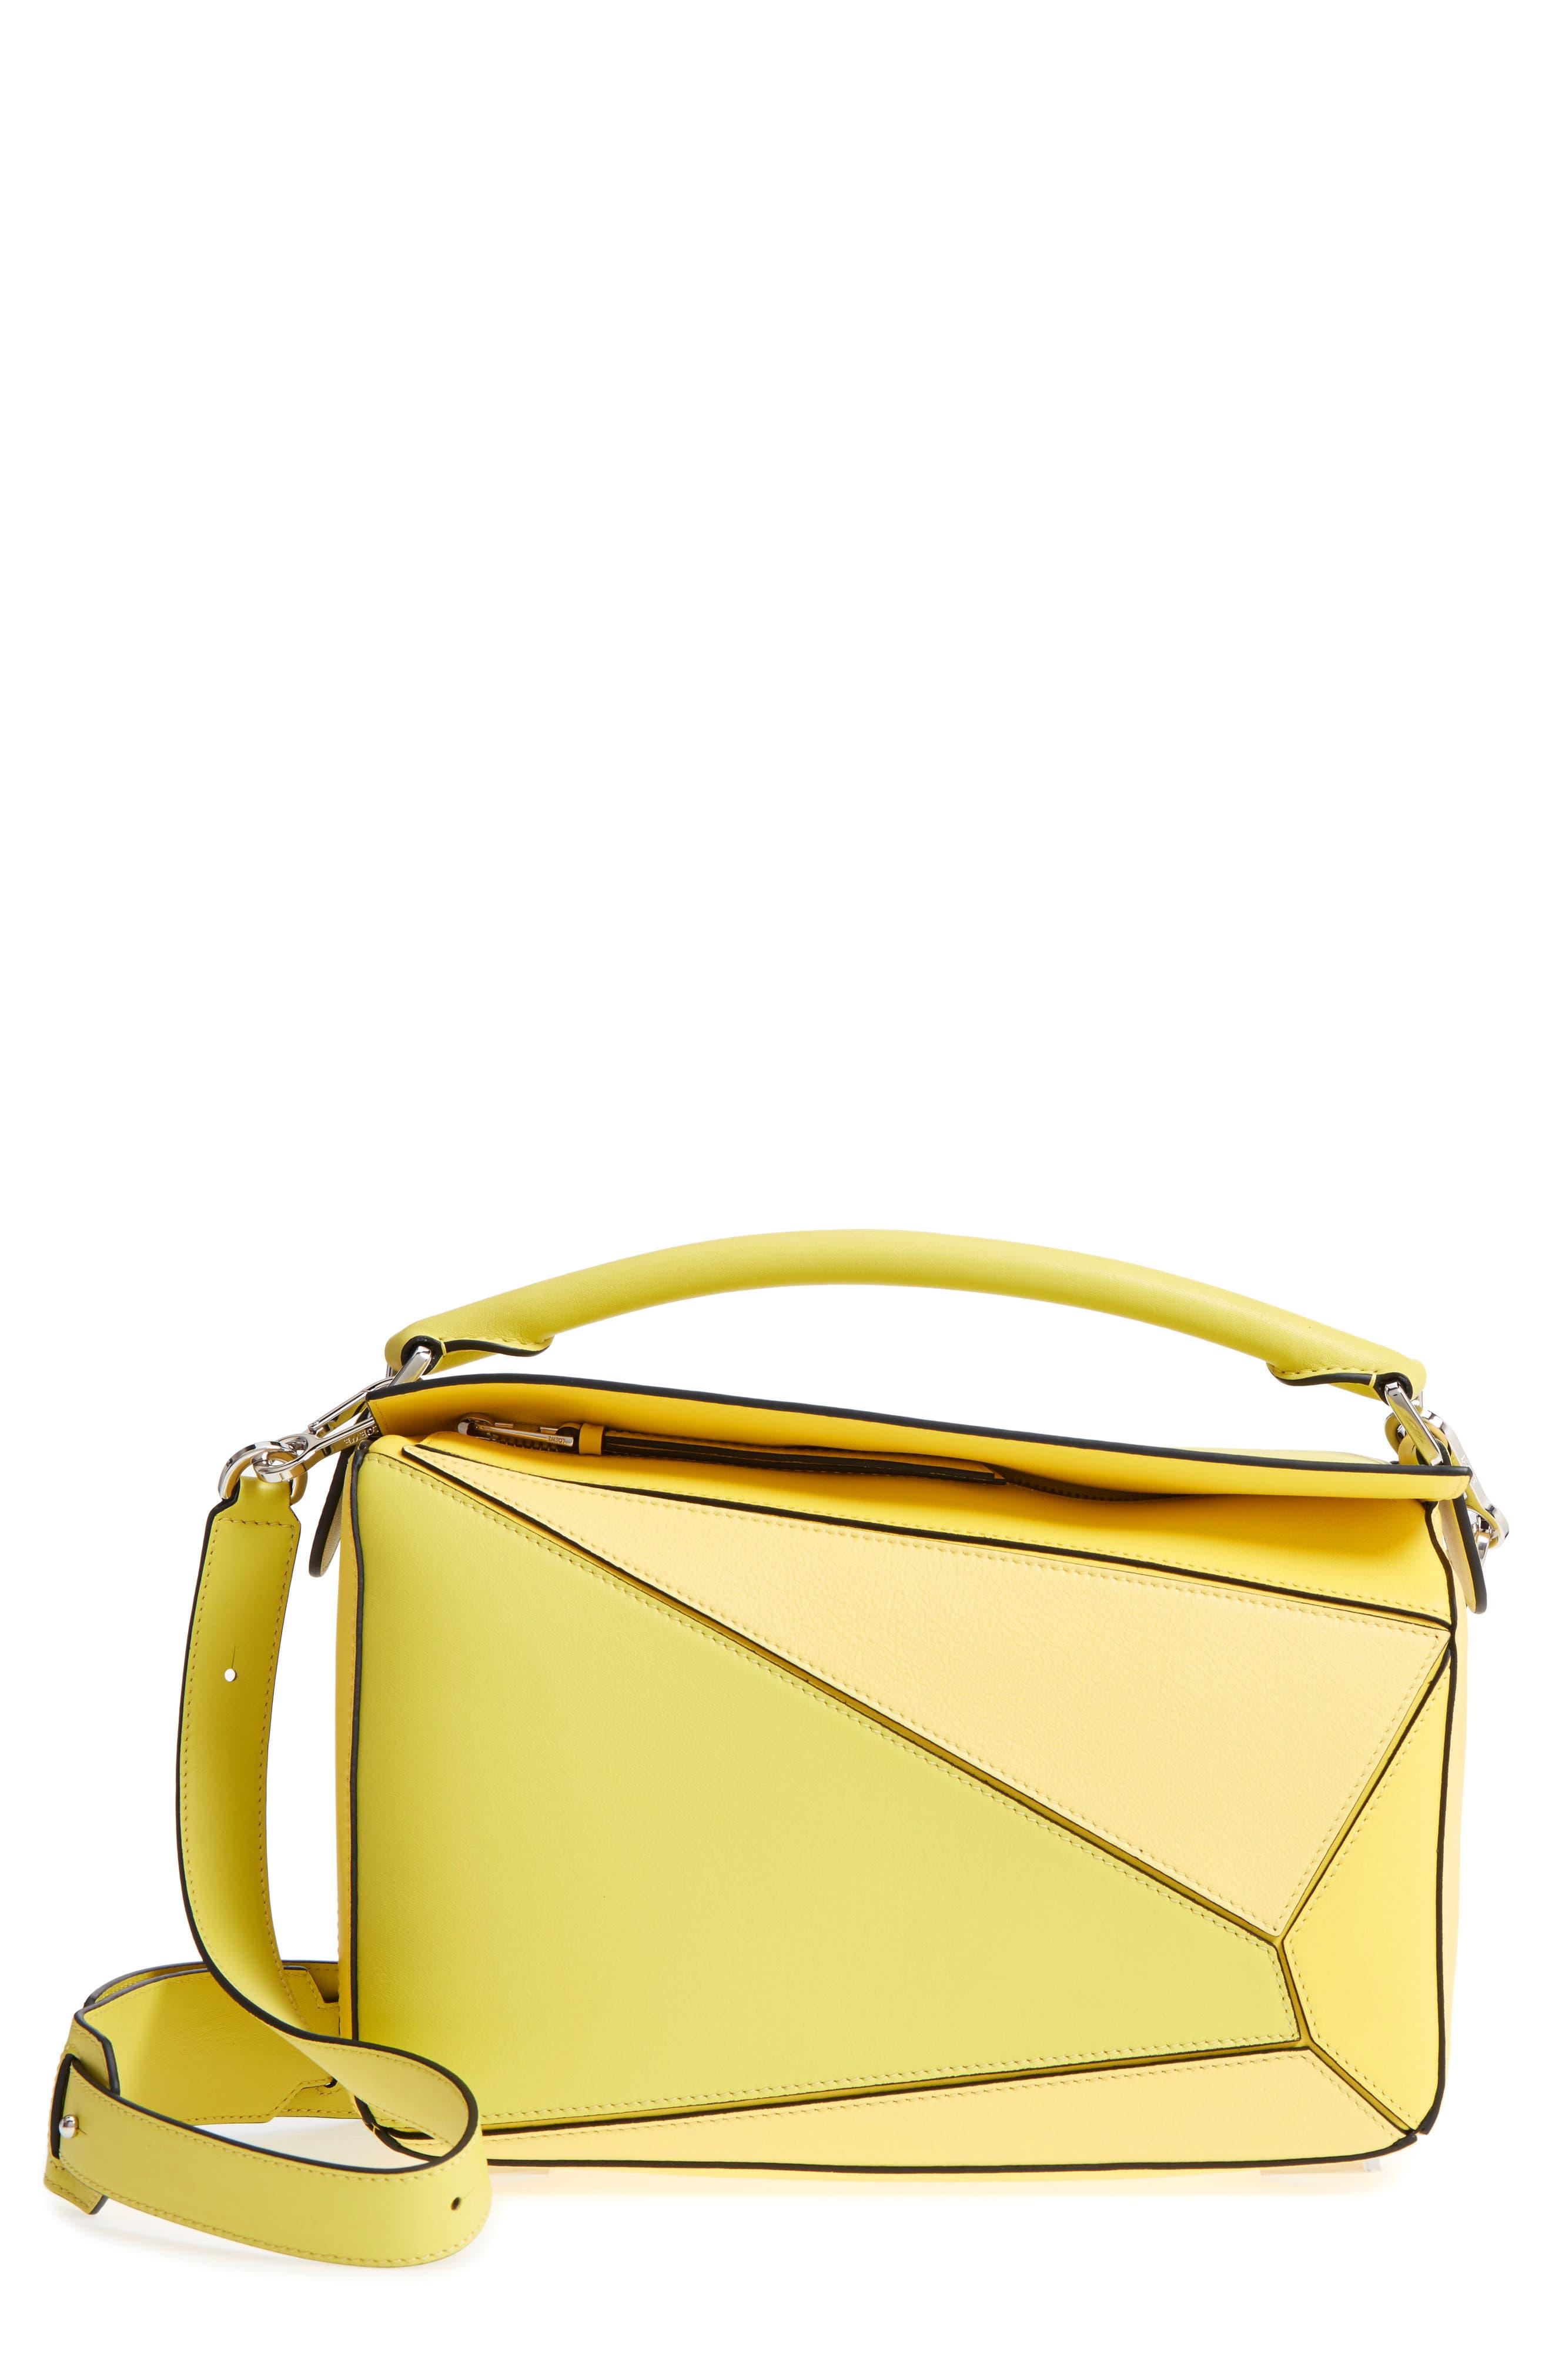 Medium Puzzle Calfskin Leather Shoulder Bag,                         Main,                         color, Yellow Multitone